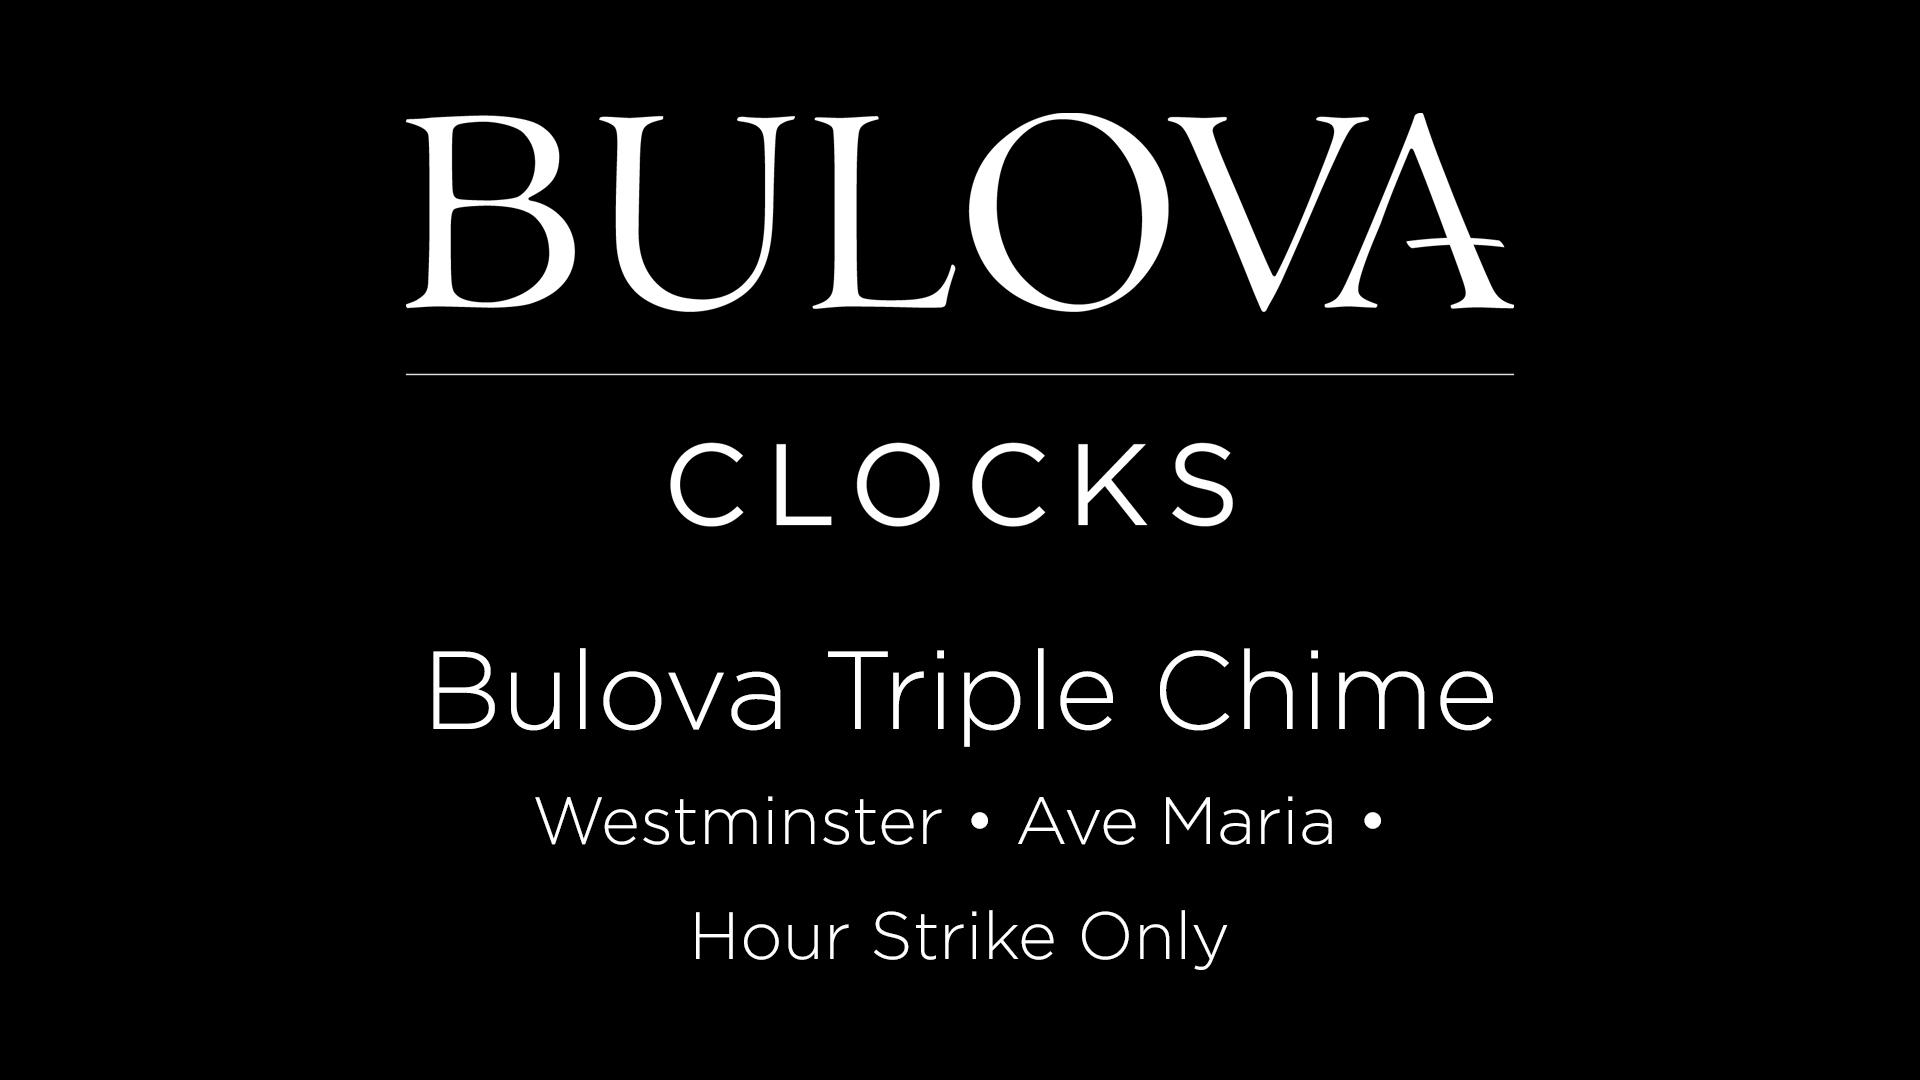 Bulova Dalton Chiming Pendulum Table Clock - Walnut Finish - Gold-Tone Accents - Walnut Finish Polished Goldstone Bezel Westminster Melody On The Hour - clocks, bedroom-decor, bedroom - 81ieYNwG64L -